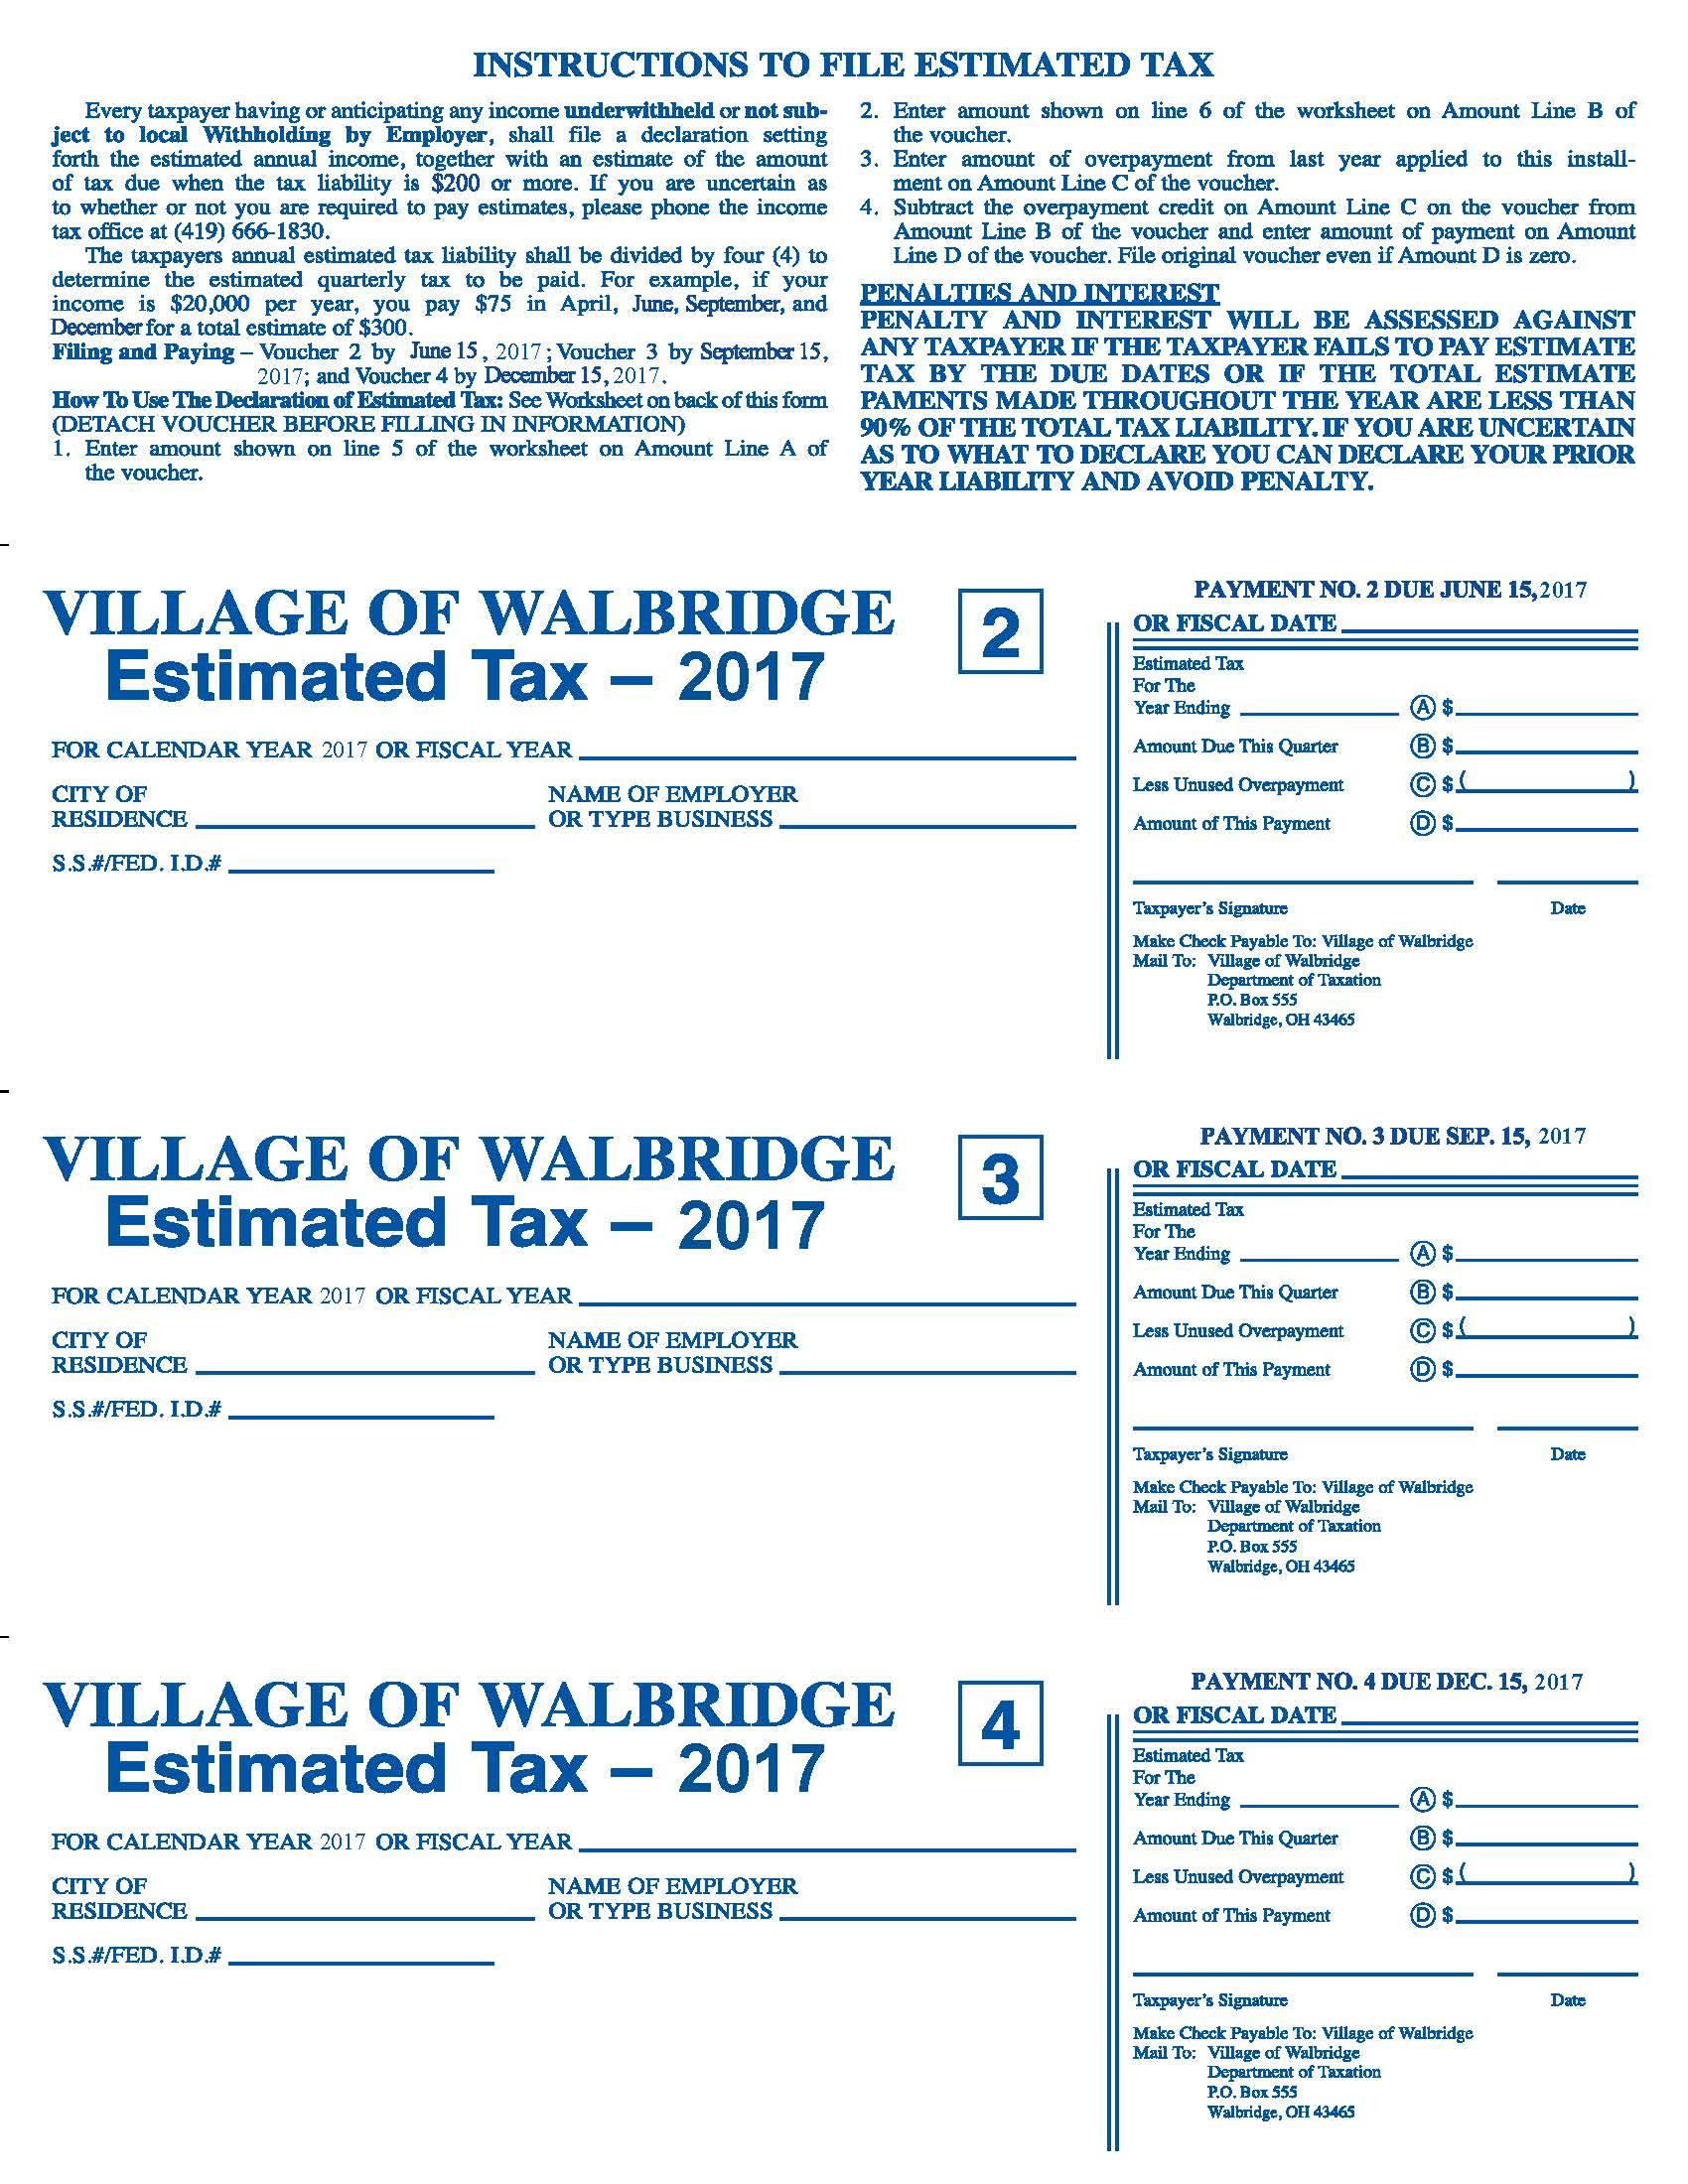 Village of Walbridge Ohio Tax Forms